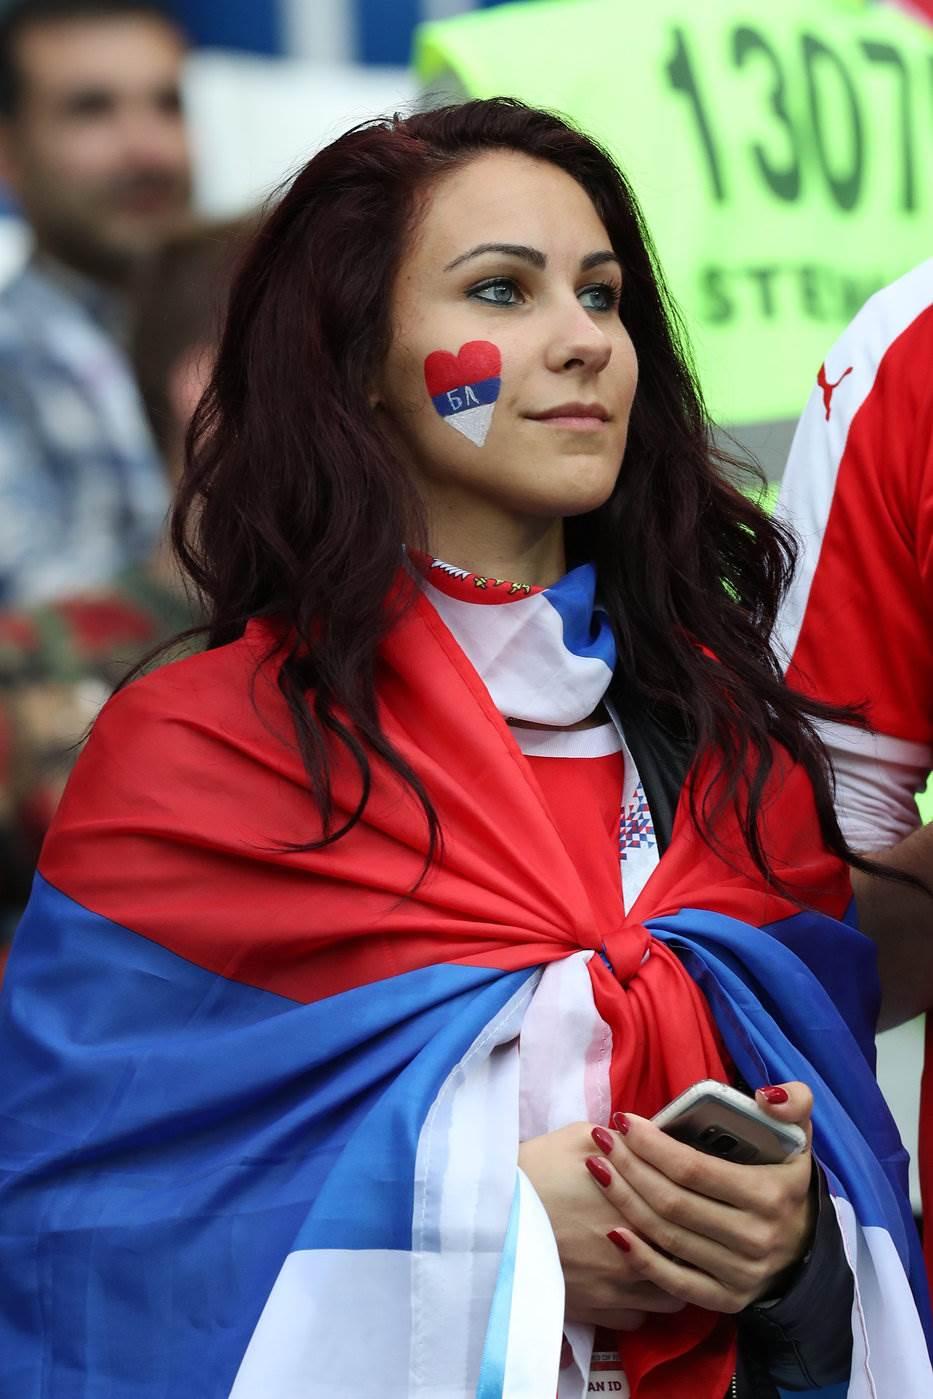 FIFA POLUDELA: ZABRANJENE zgodne cice Mundijala!